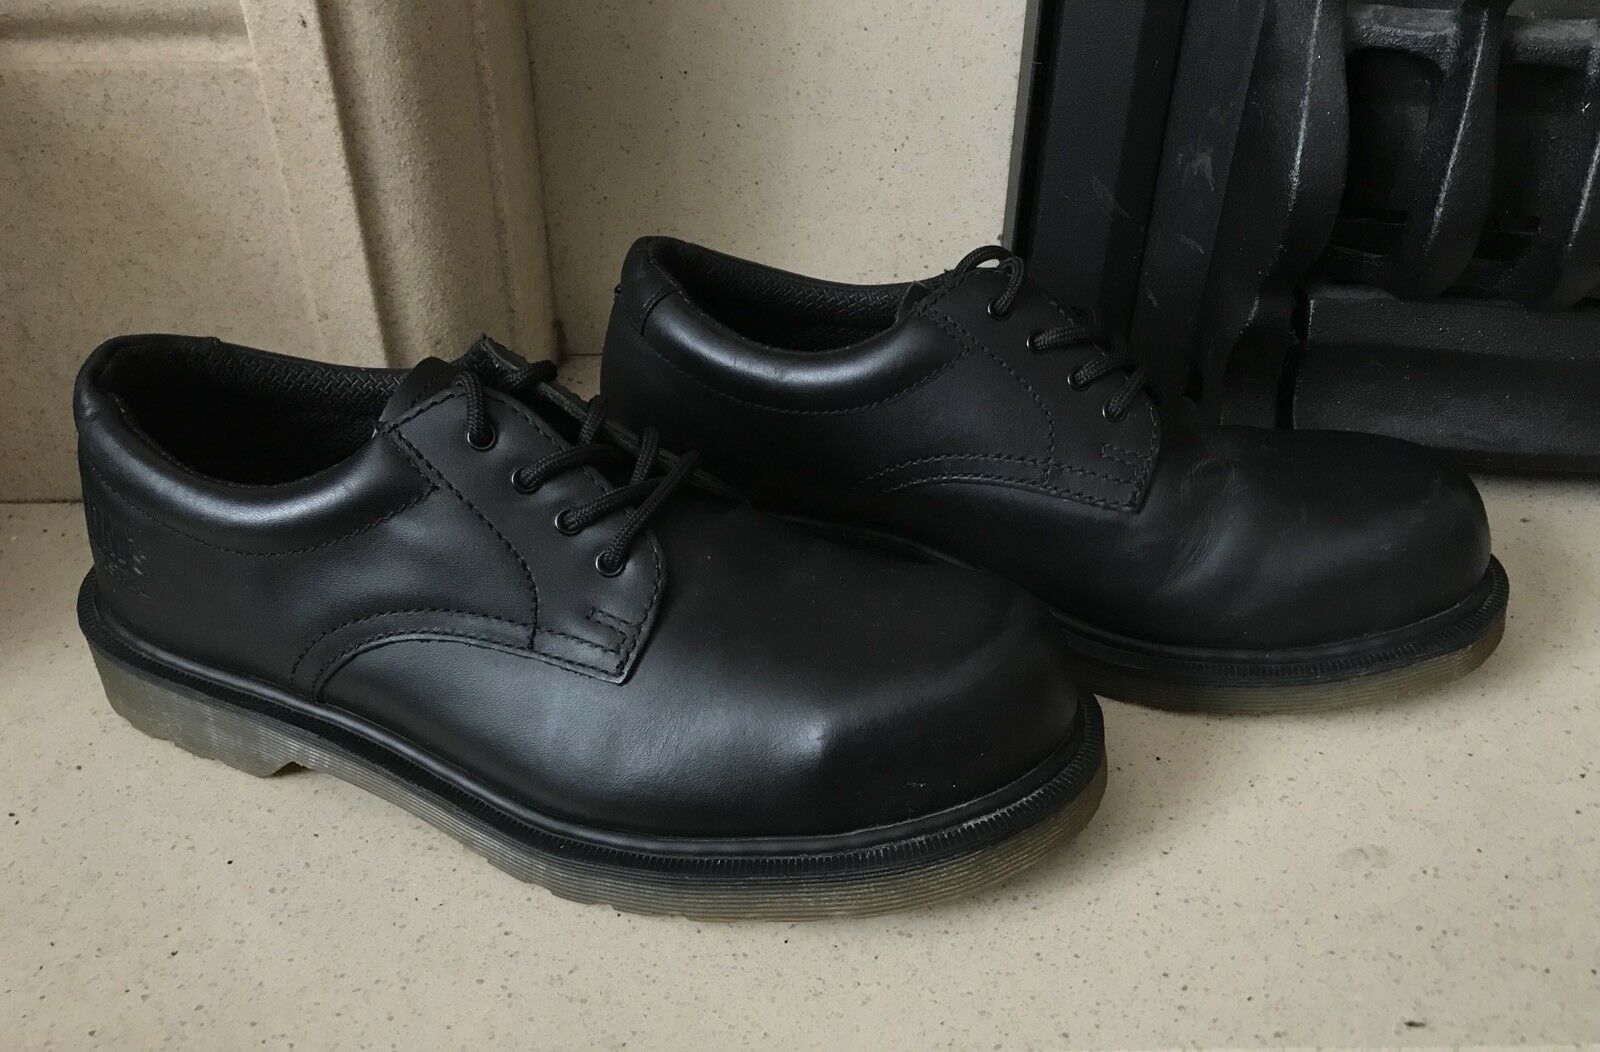 Dr Martens Industrial Men's Größe Steel Toe Cap Schuhes Größe Men's 8 348f98